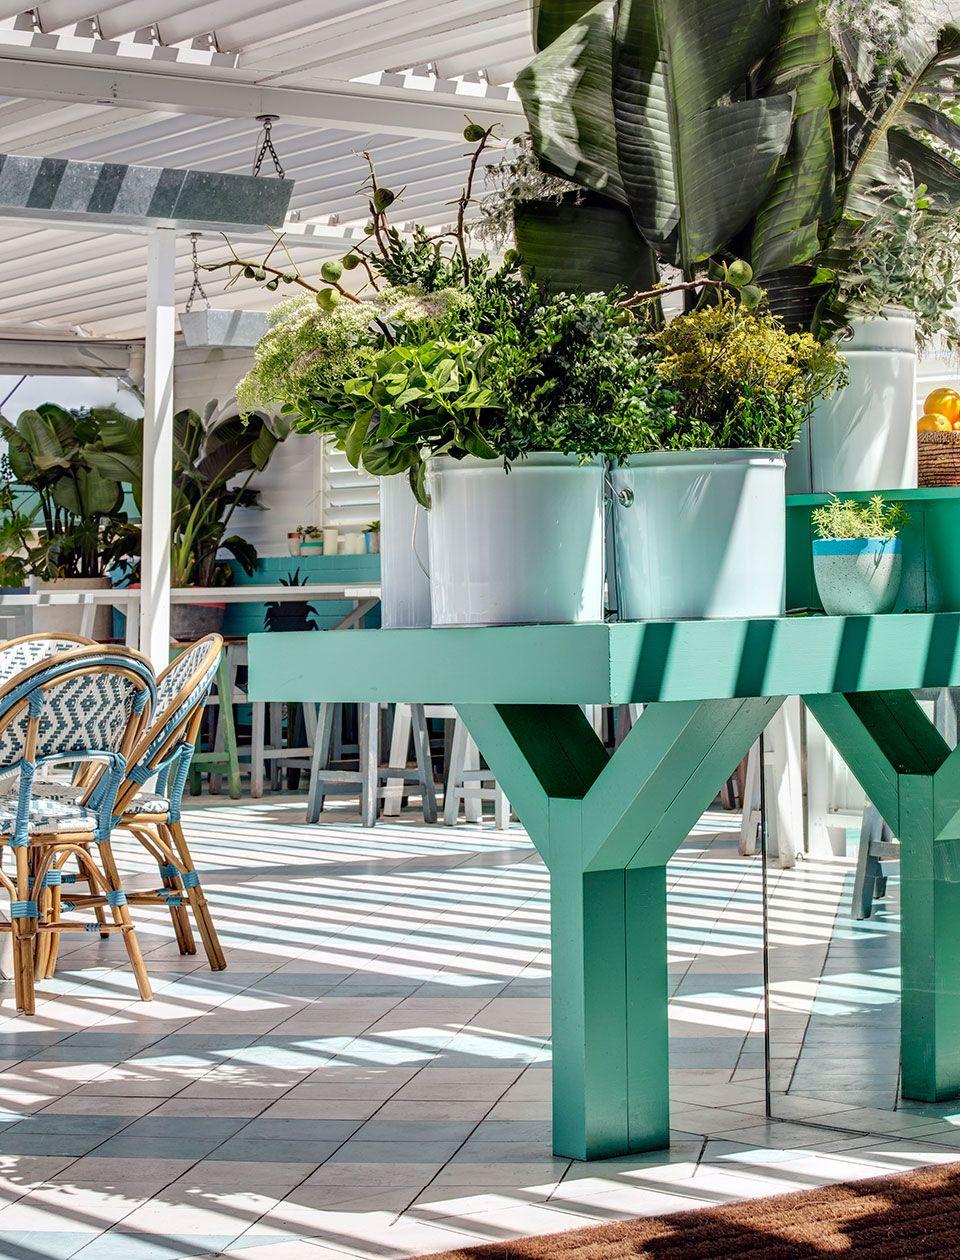 watsons bay hotel beach club interior design by alexander and co rh pinterest com